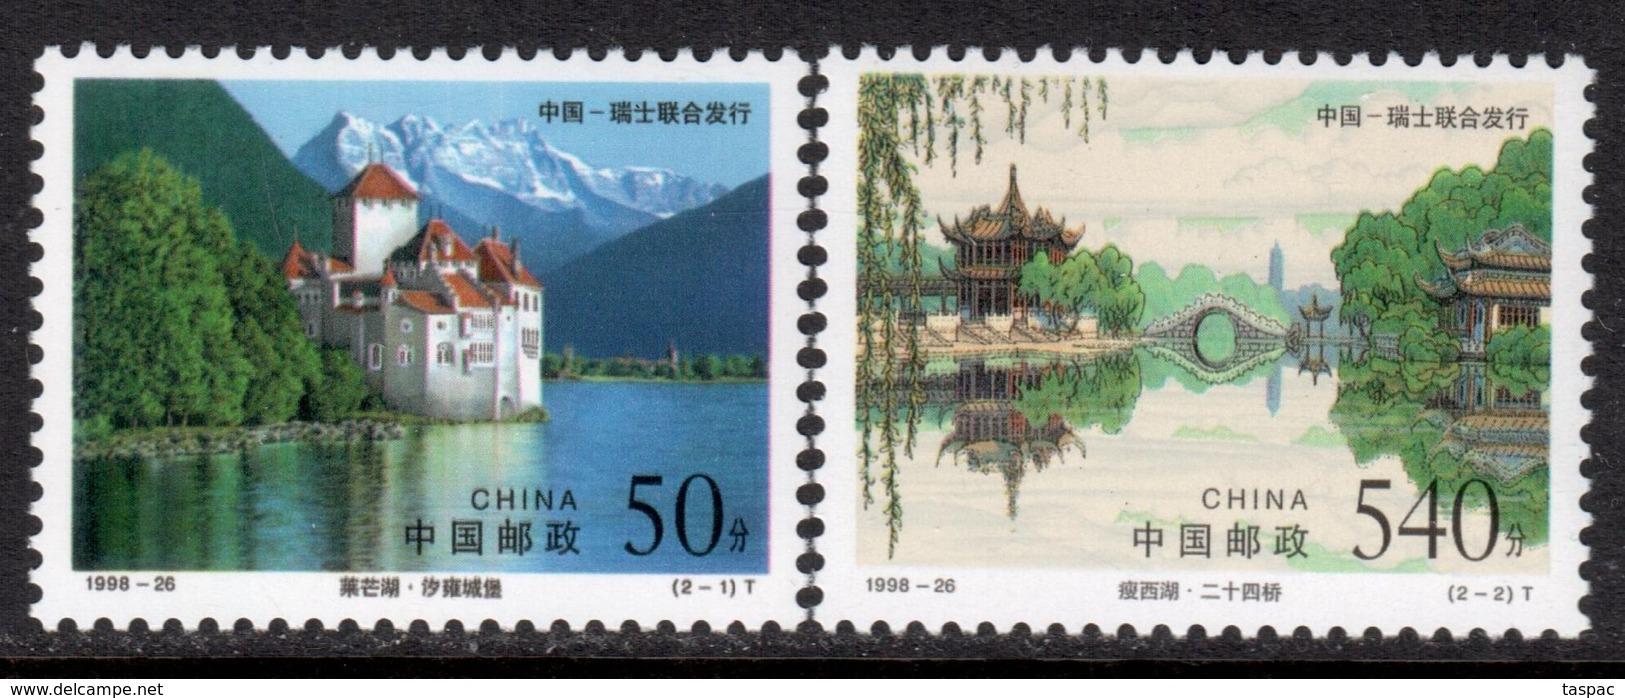 China P.R. 1998 Mi# 2967-2968 ** MNH - Chillon Castle, Lake Geneva / Bridge 24, Slender West Lake, Yangzhou - Unused Stamps